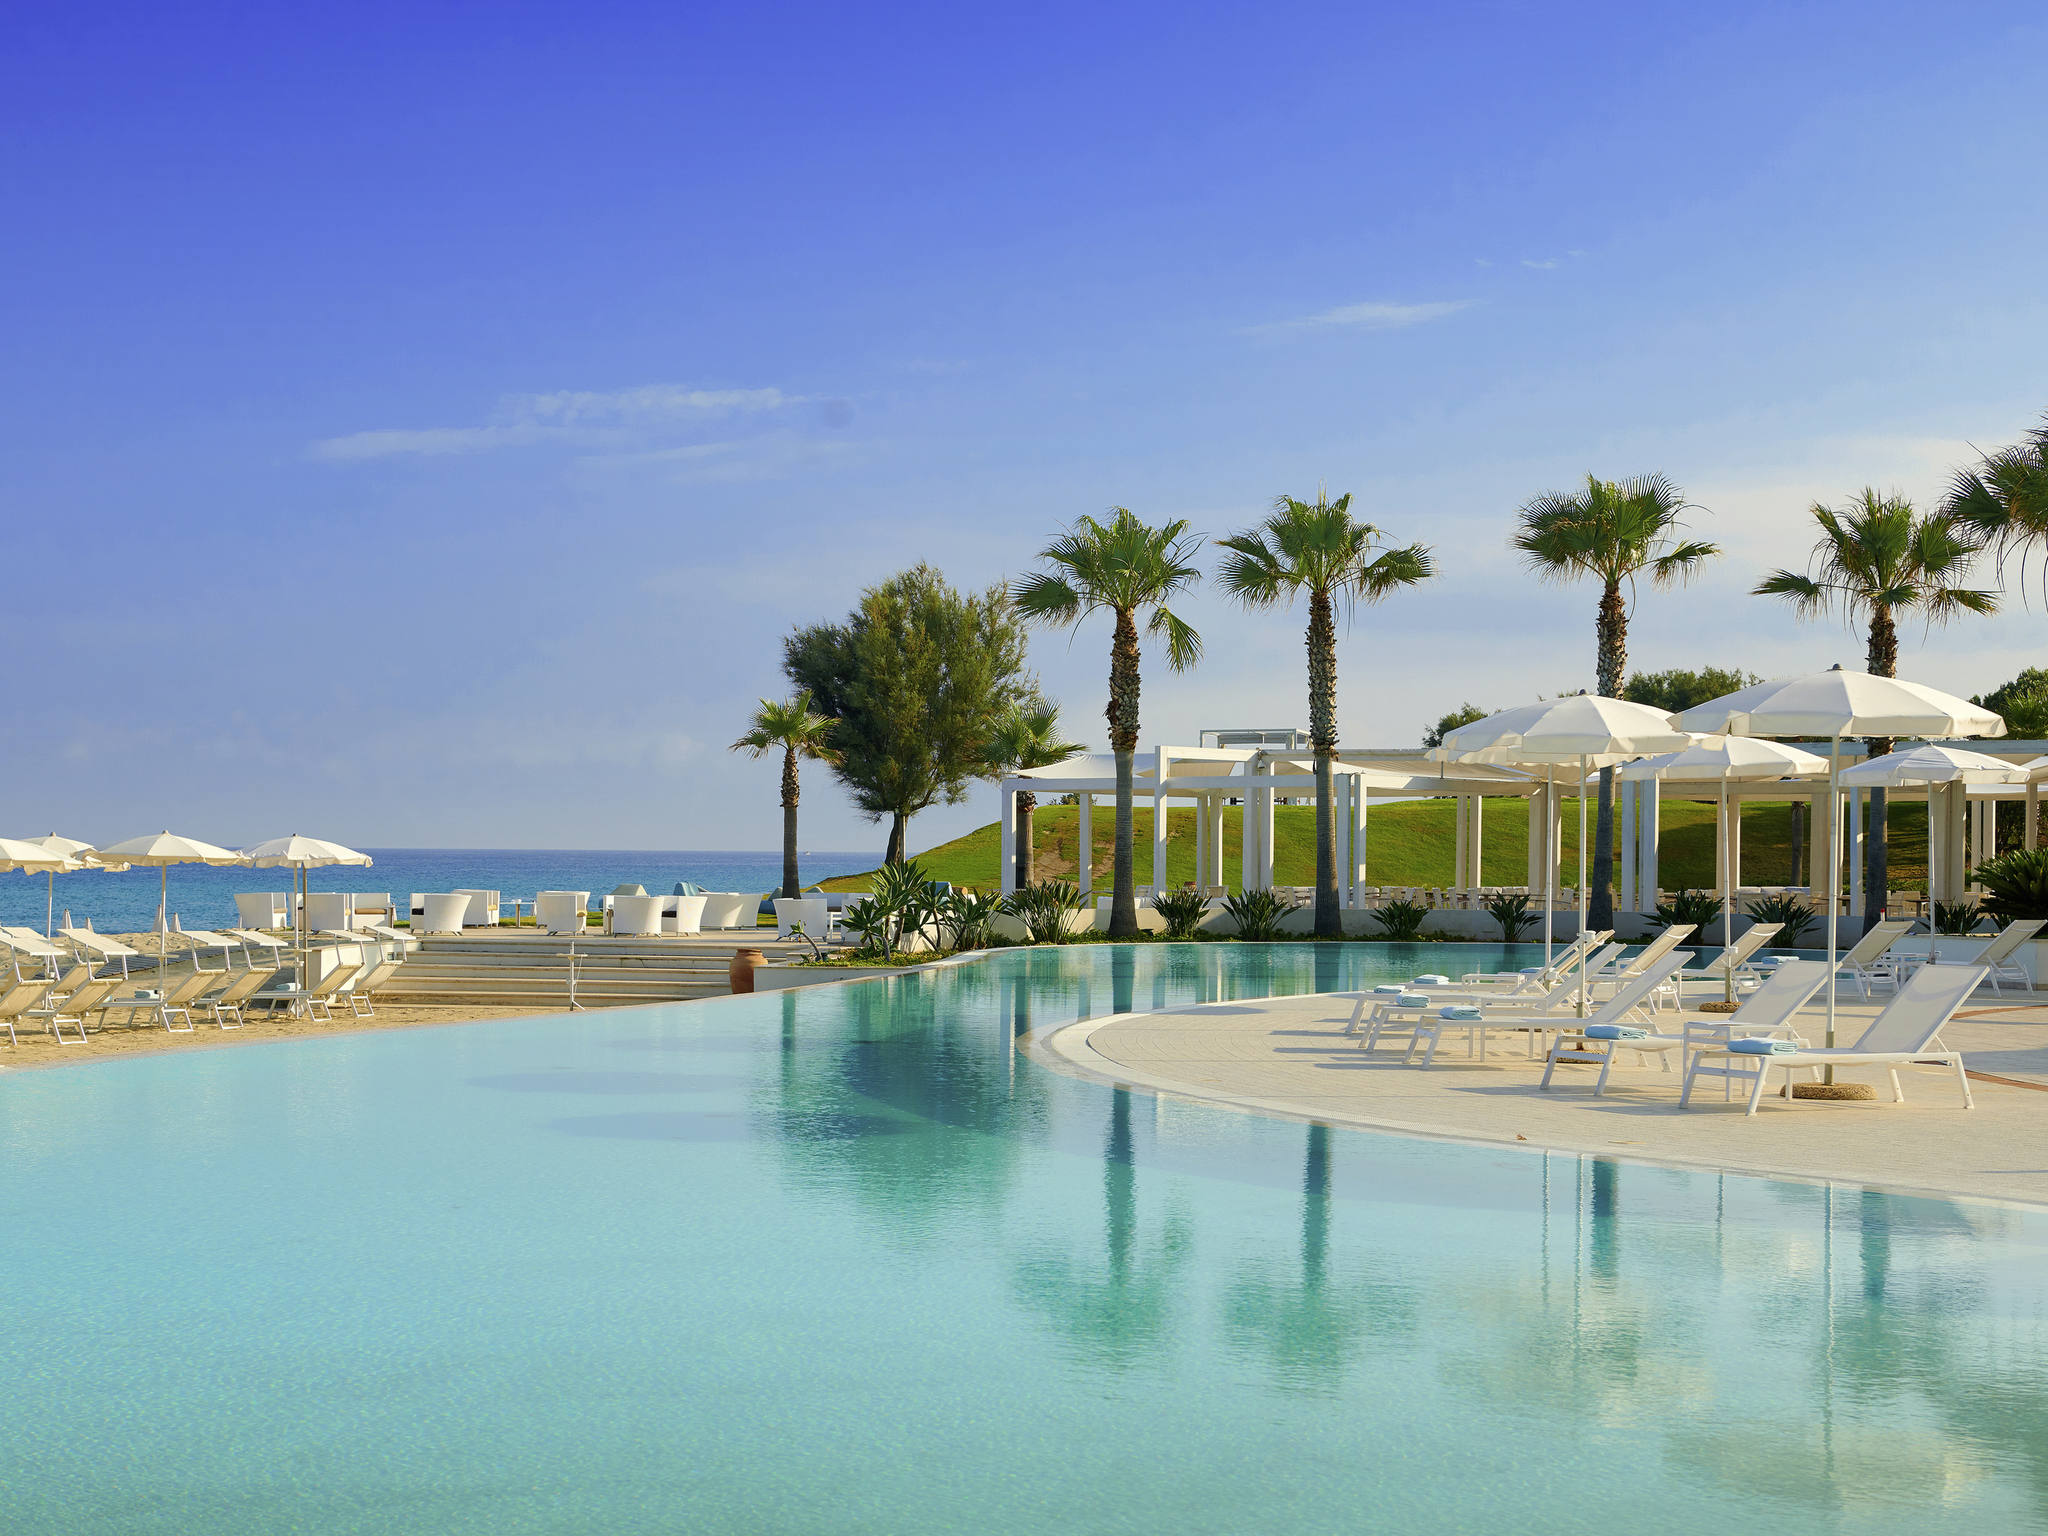 Hôtel - Capovaticano Resort Thalasso & Spa - MGallery by Sofitel